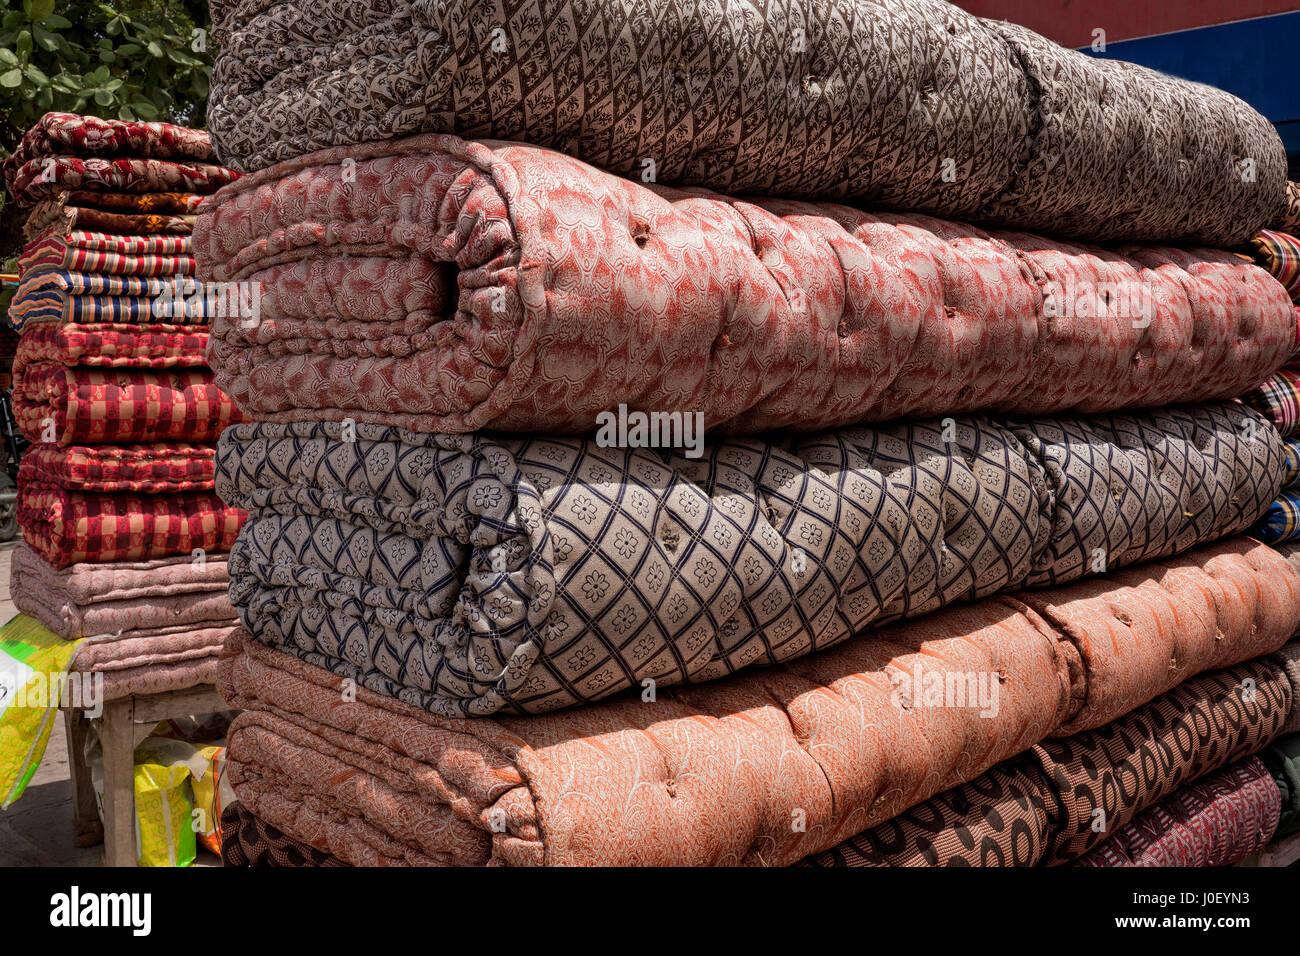 Cotton mattresses, varanasi, uttar pradesh, india, asia - Stock Image